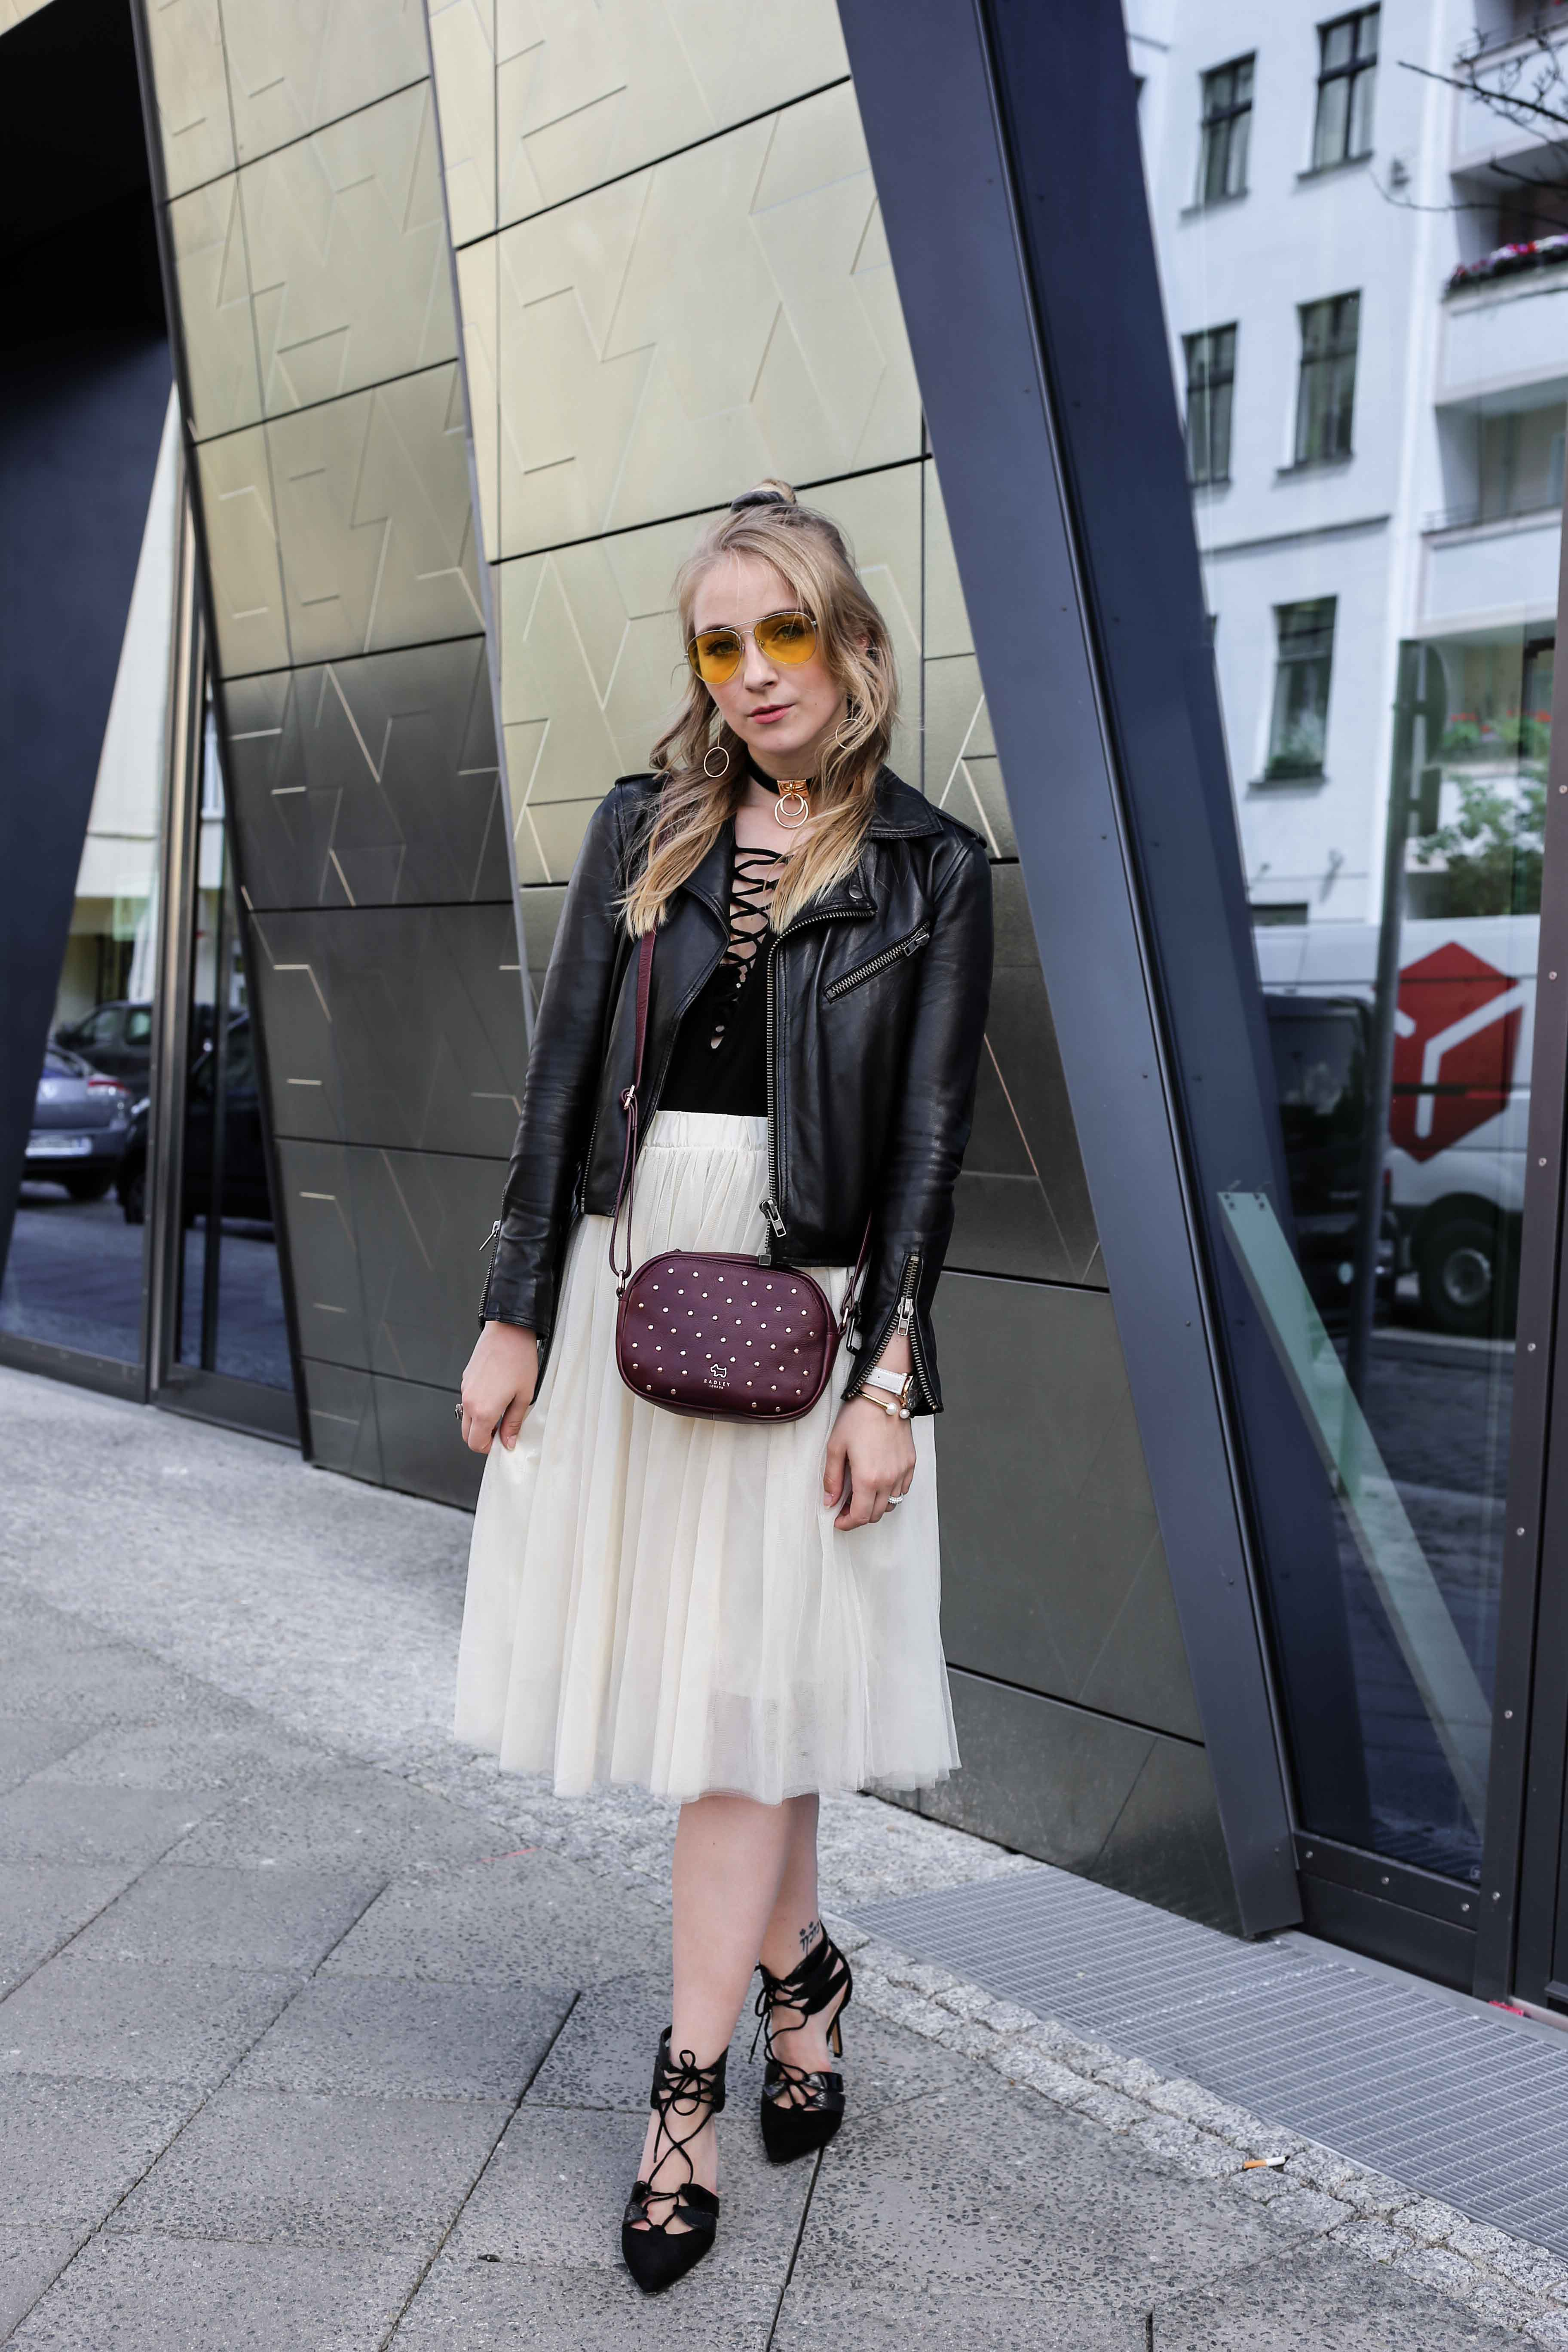 fashion-week-look-schnürbody-plisseerock-retro-sonnenbrille-fashionblog-modeblog-berlin-köln_8763